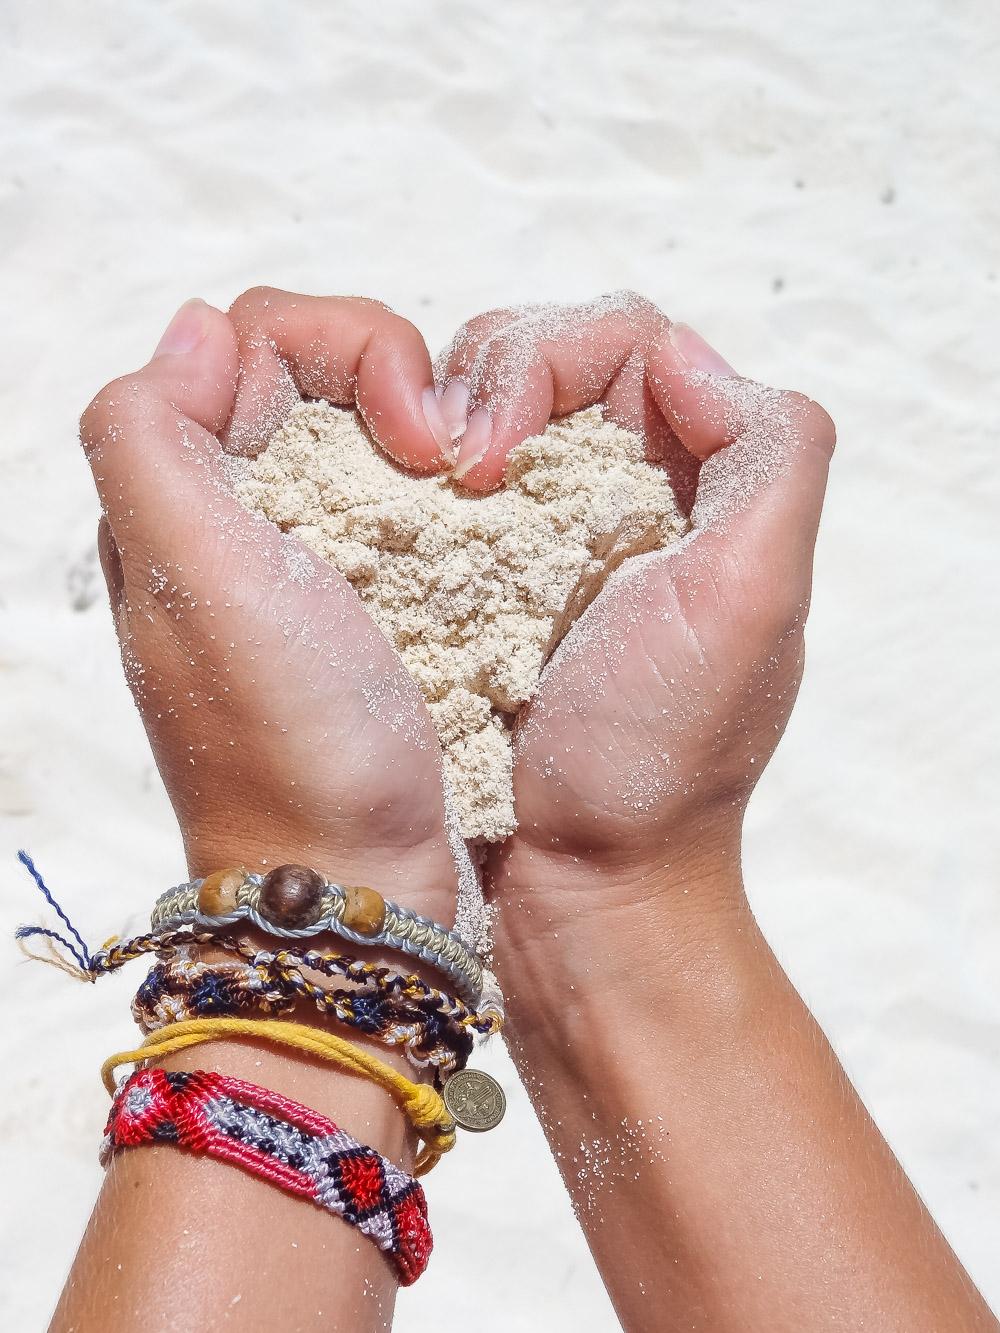 Isla Mujeres wit zand mexico